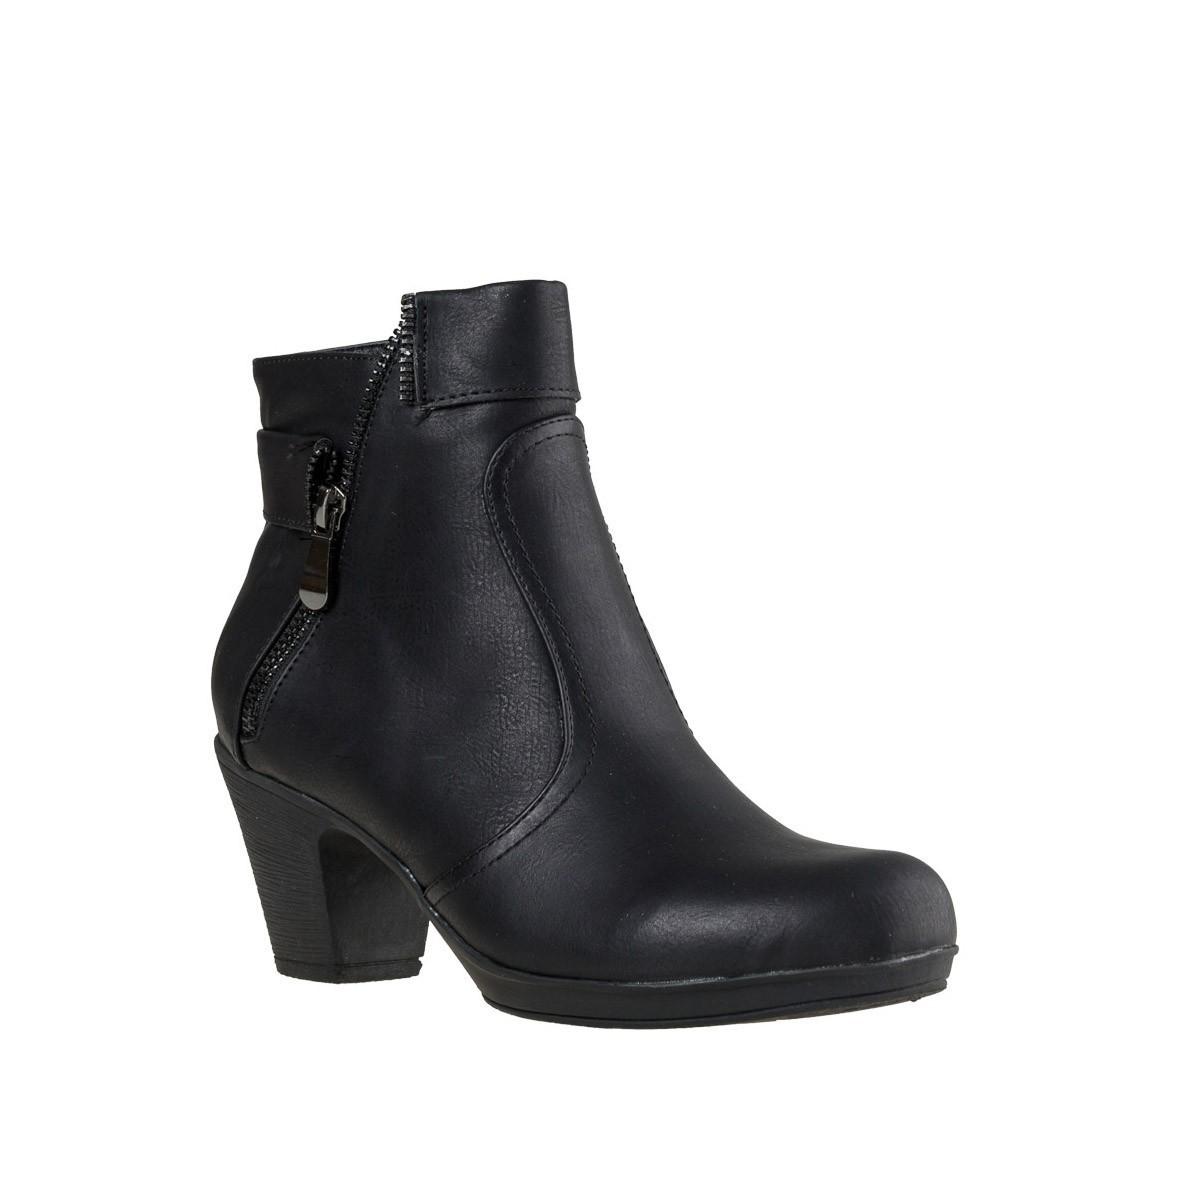 Envie Γυναικεία Παπούτσια Μποτάκια 64-0991 Μαύρο Envie 64-0991 mauro